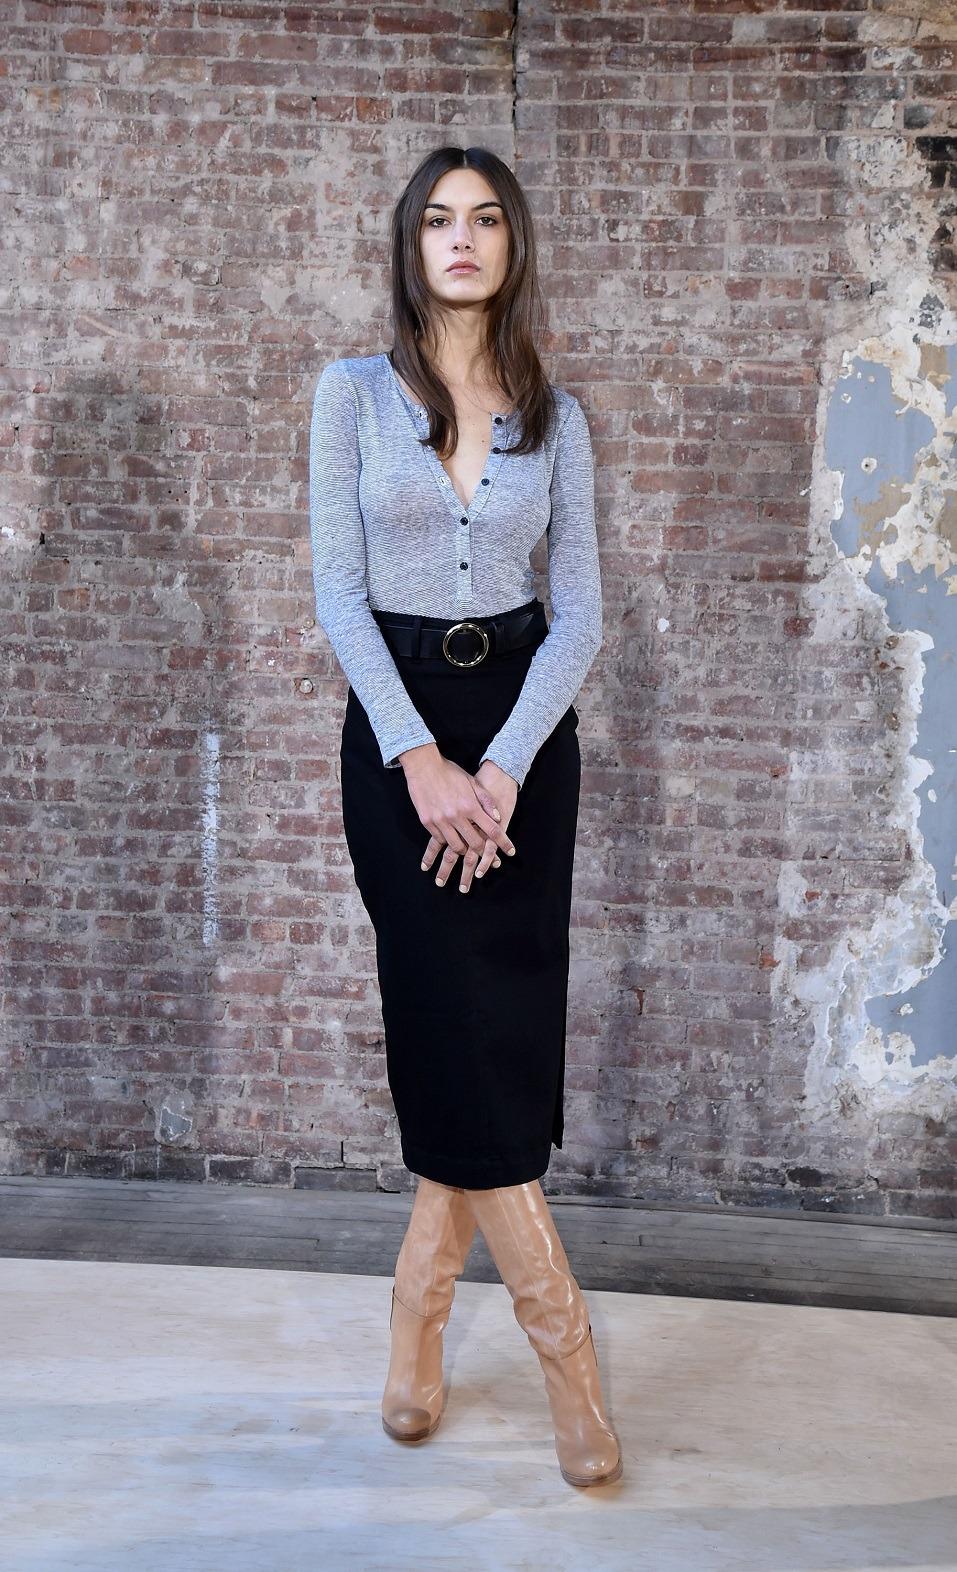 A model poses at the Frame Denim presentation during Mercedes-Benz Fashion Week